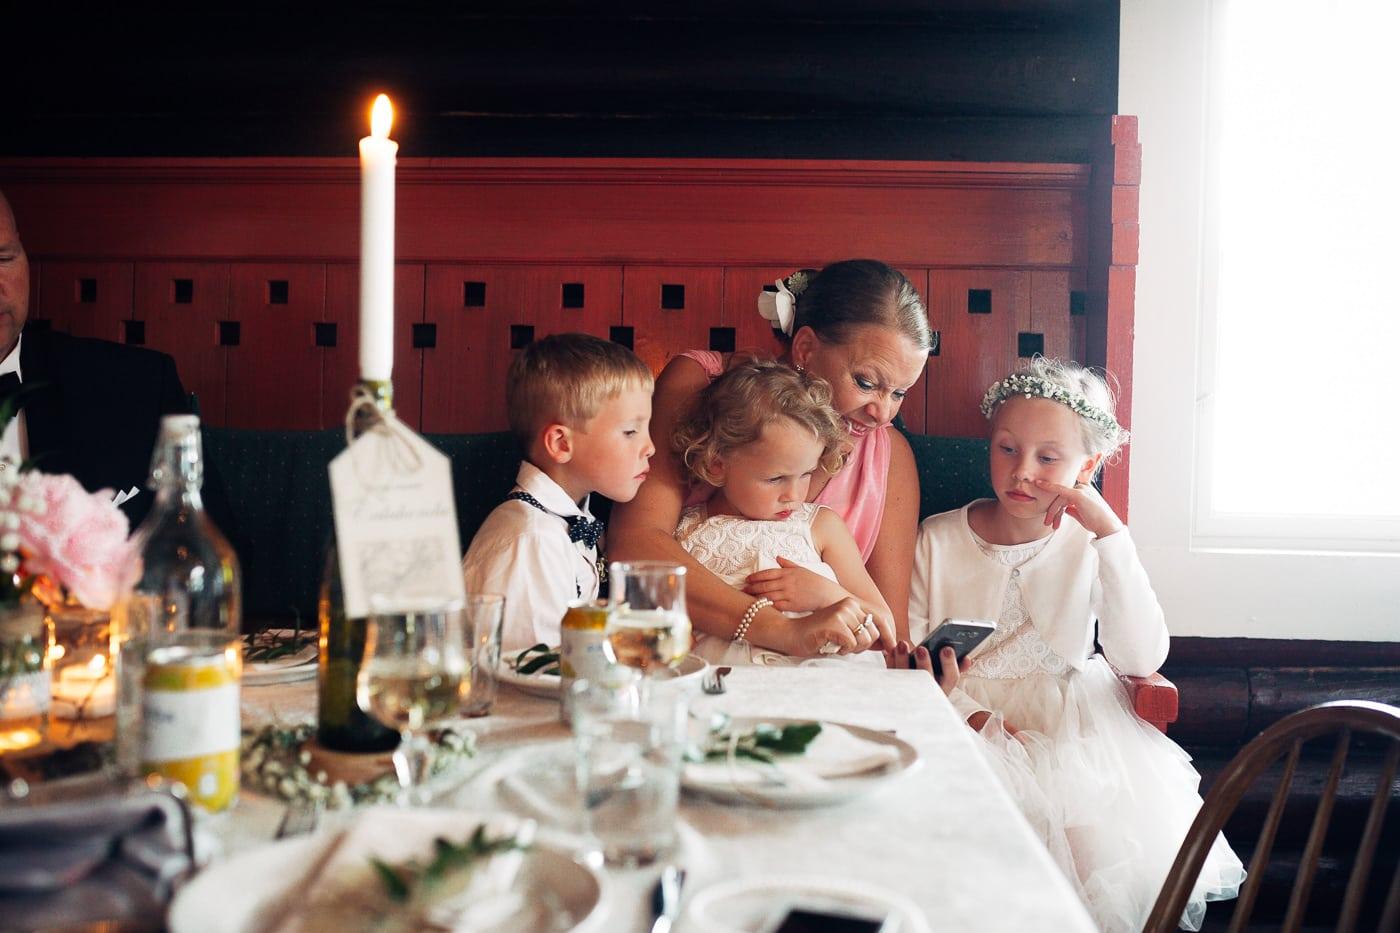 Karoline & Andreas - bryllup i Østfold med magiske detaljer Bryllup Fredrikstad Fotograf 67